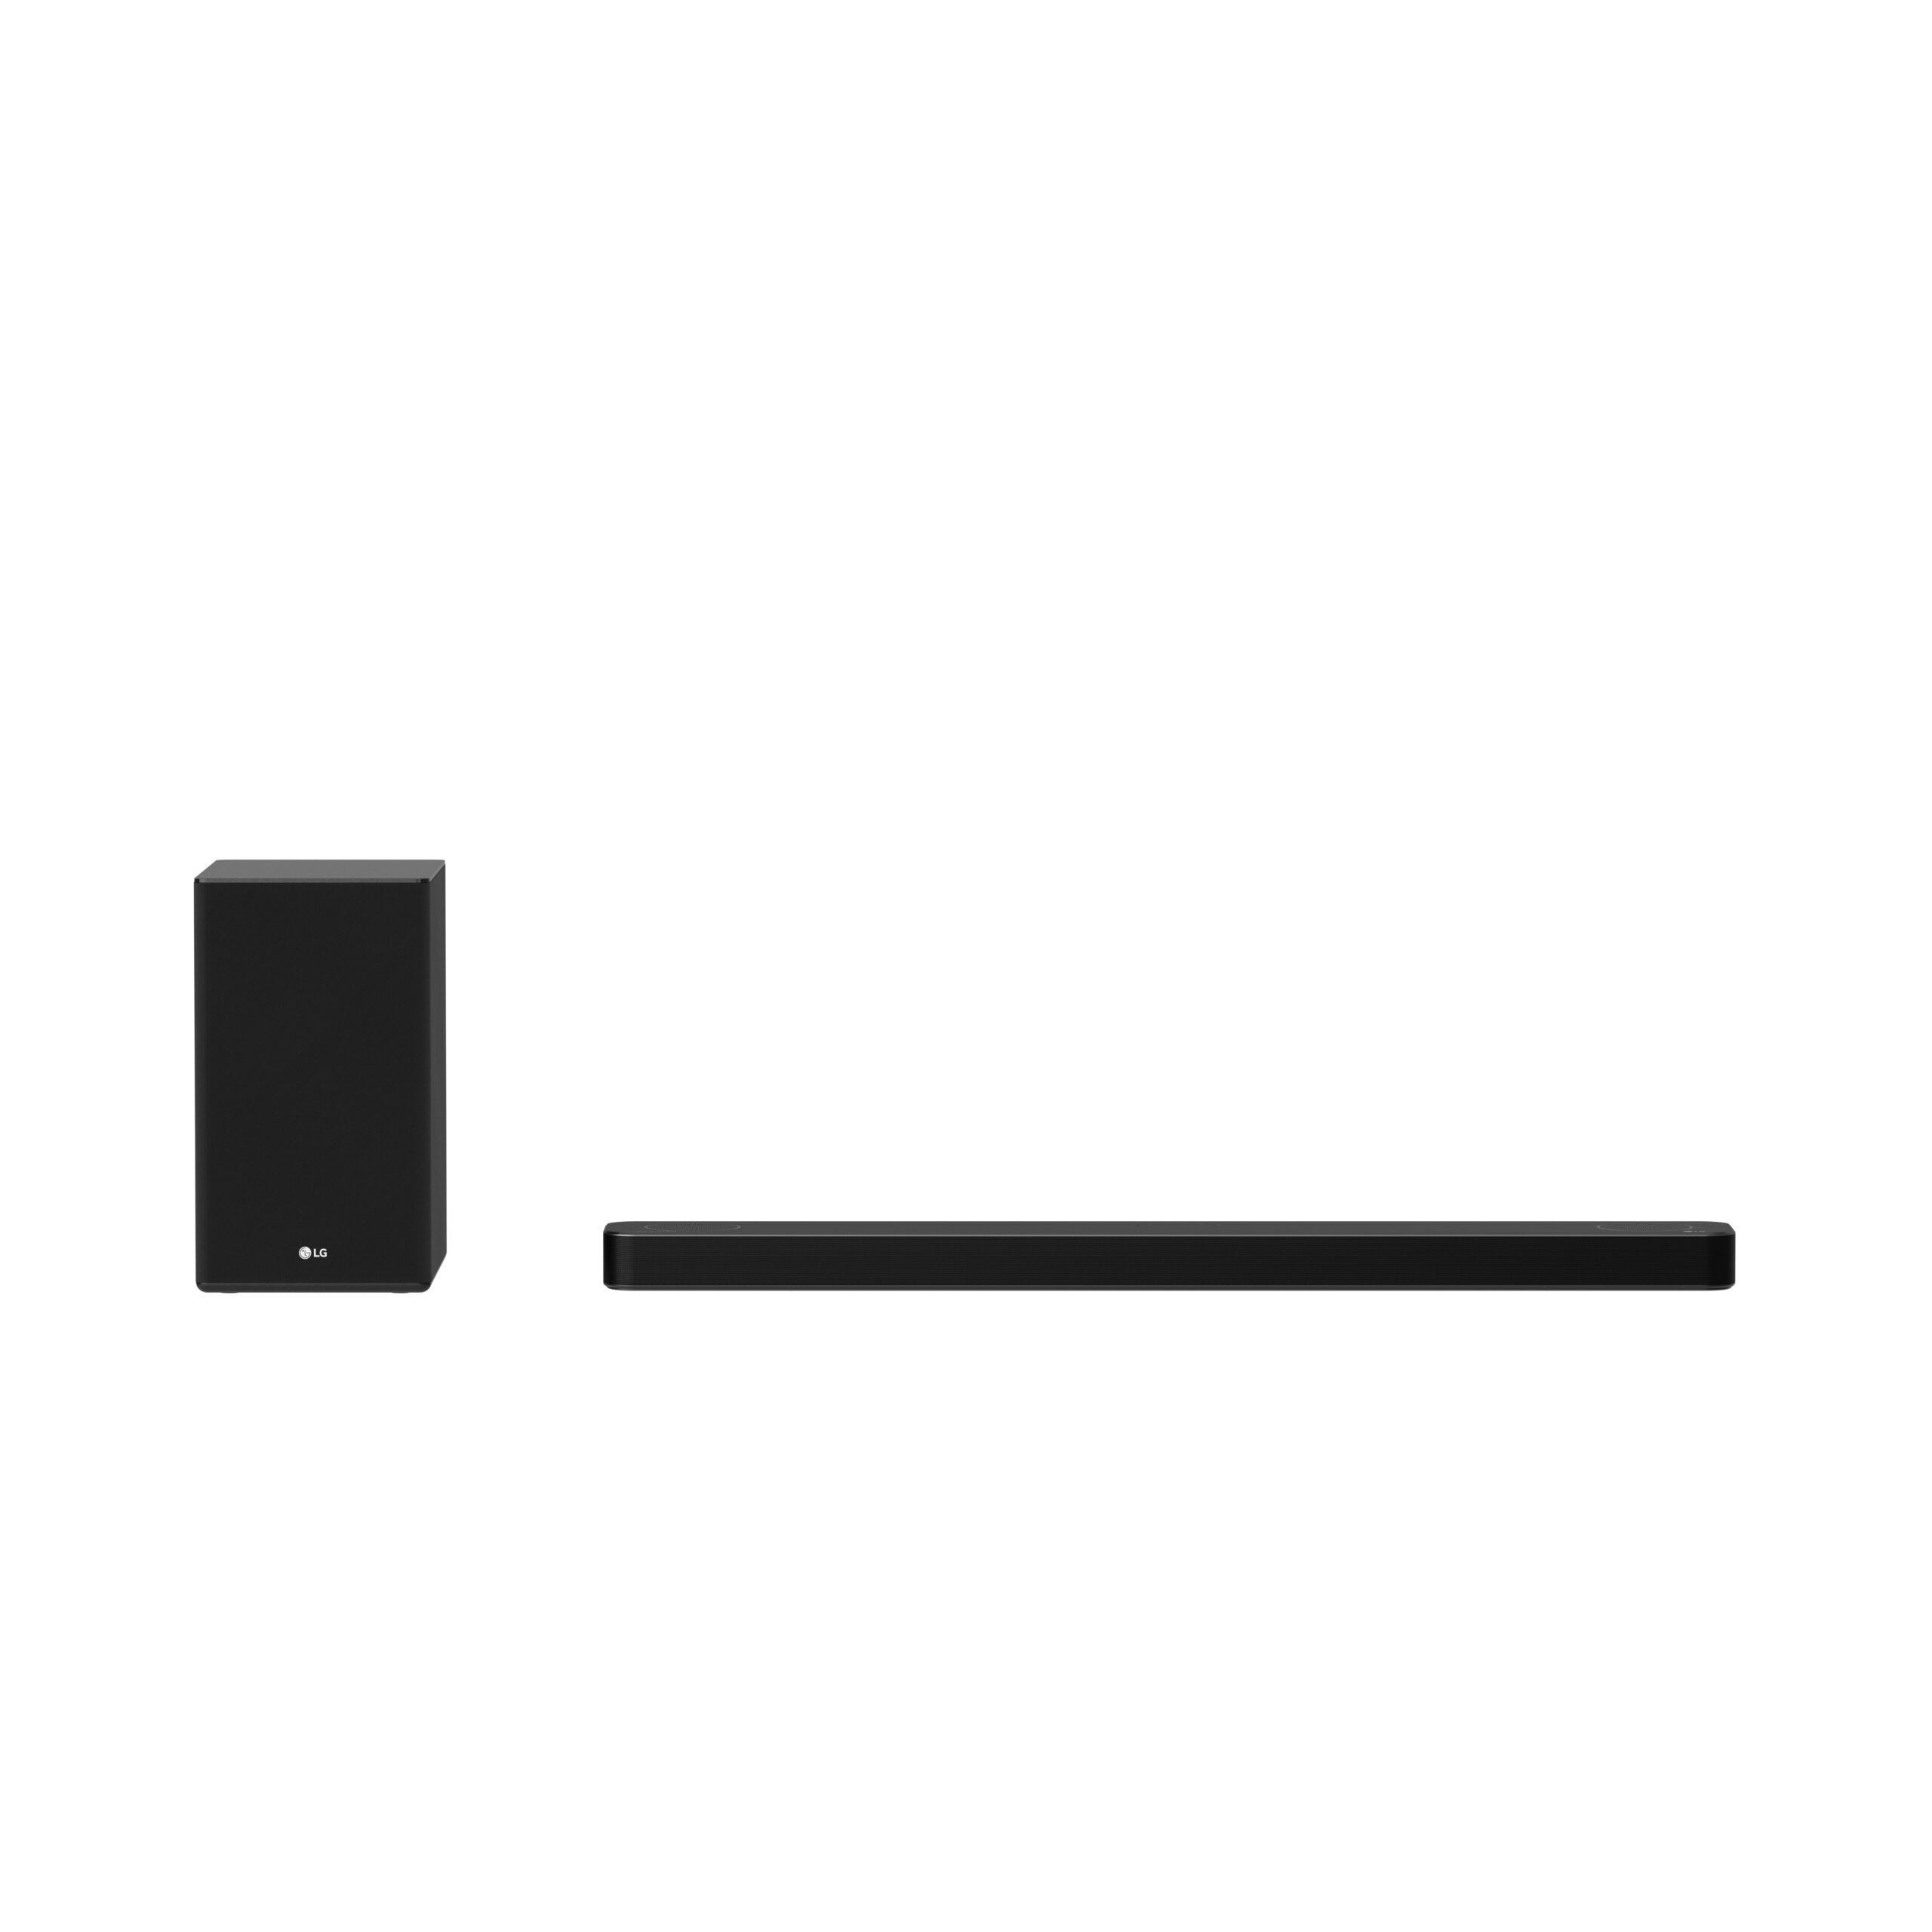 LG DSN8YG soundbar